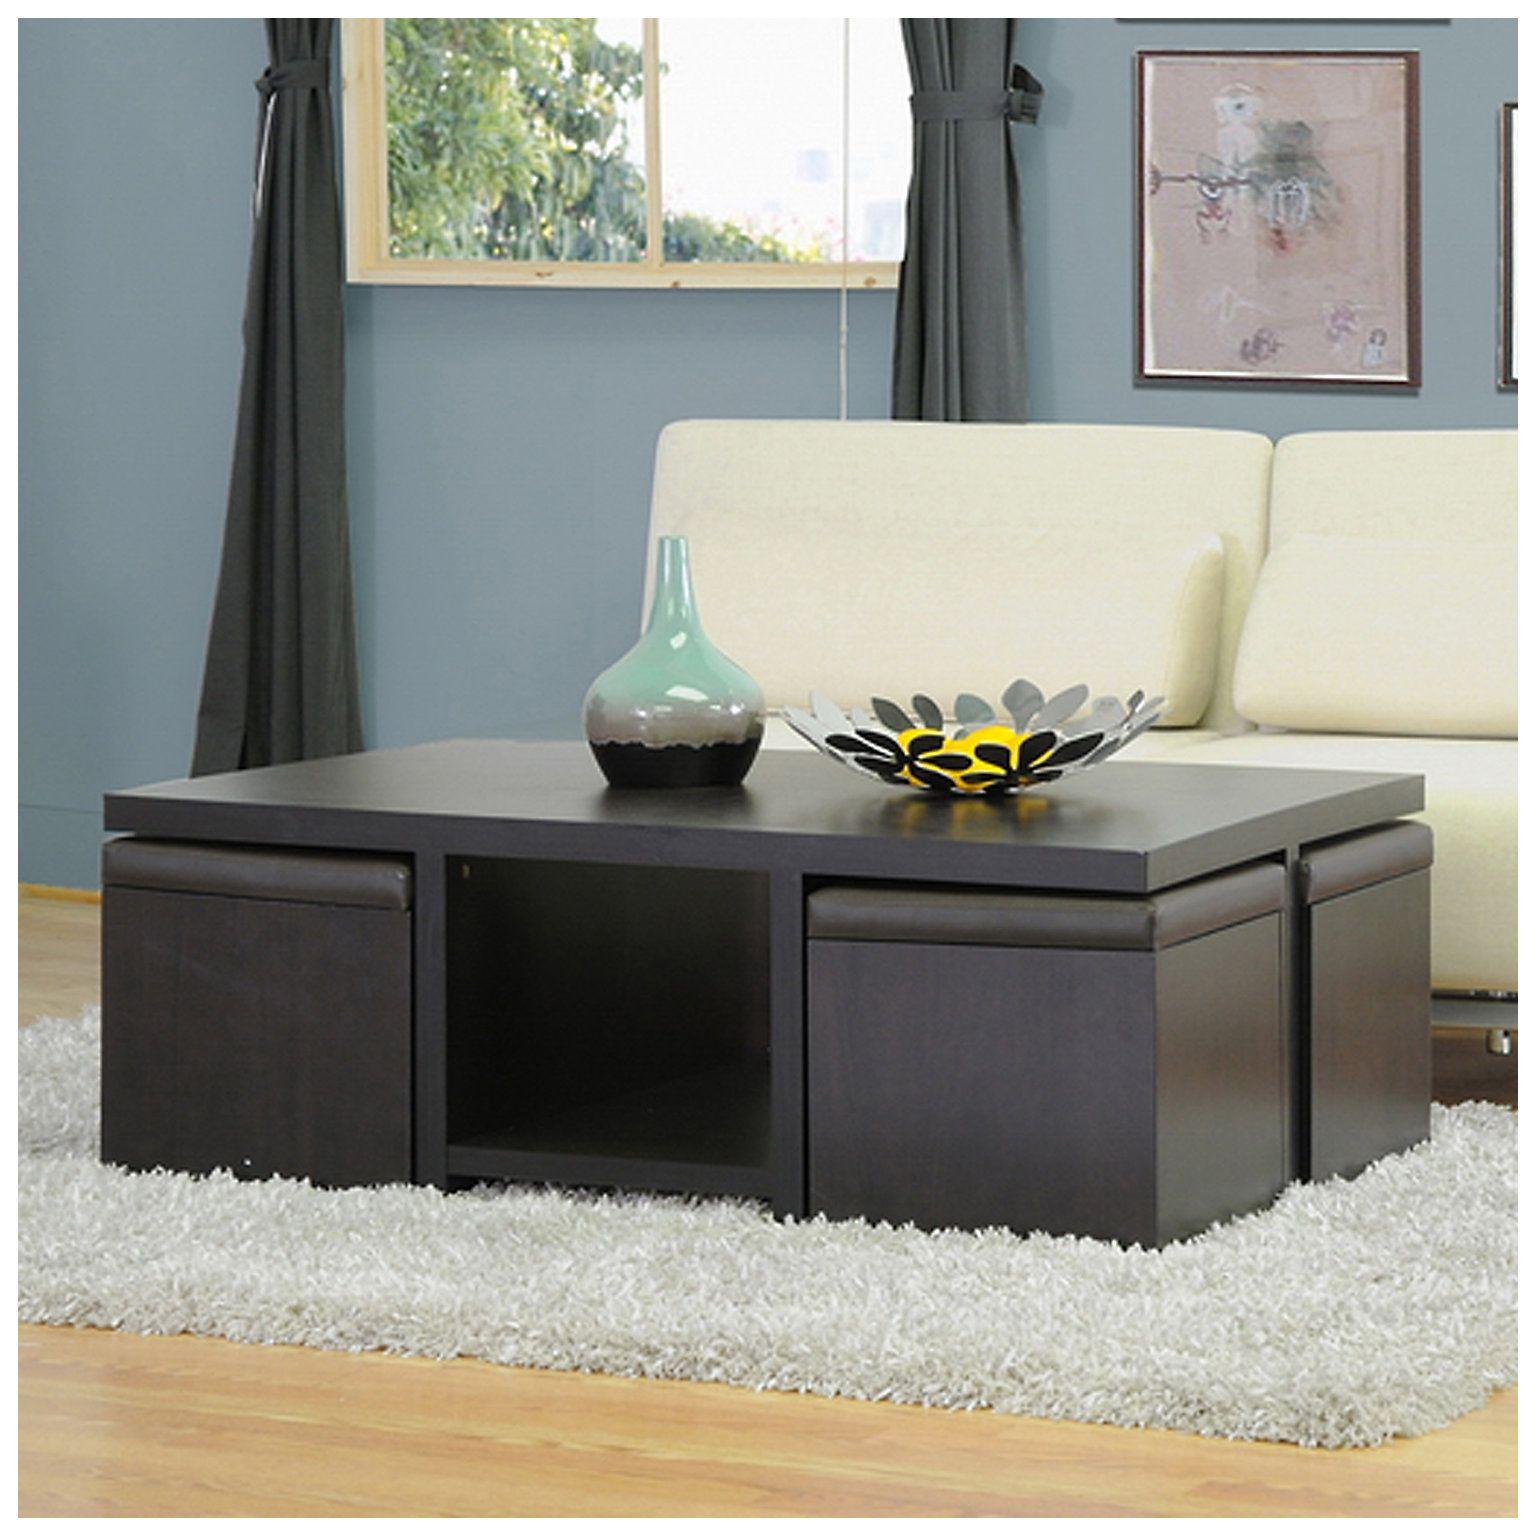 Baxton Studio Prescott 5 Piece Modern Table Stool Set Kohls In 2021 Coffee Table With Seating Coffee Table And Stool Set Coffee Table With Stools [ 1536 x 1536 Pixel ]